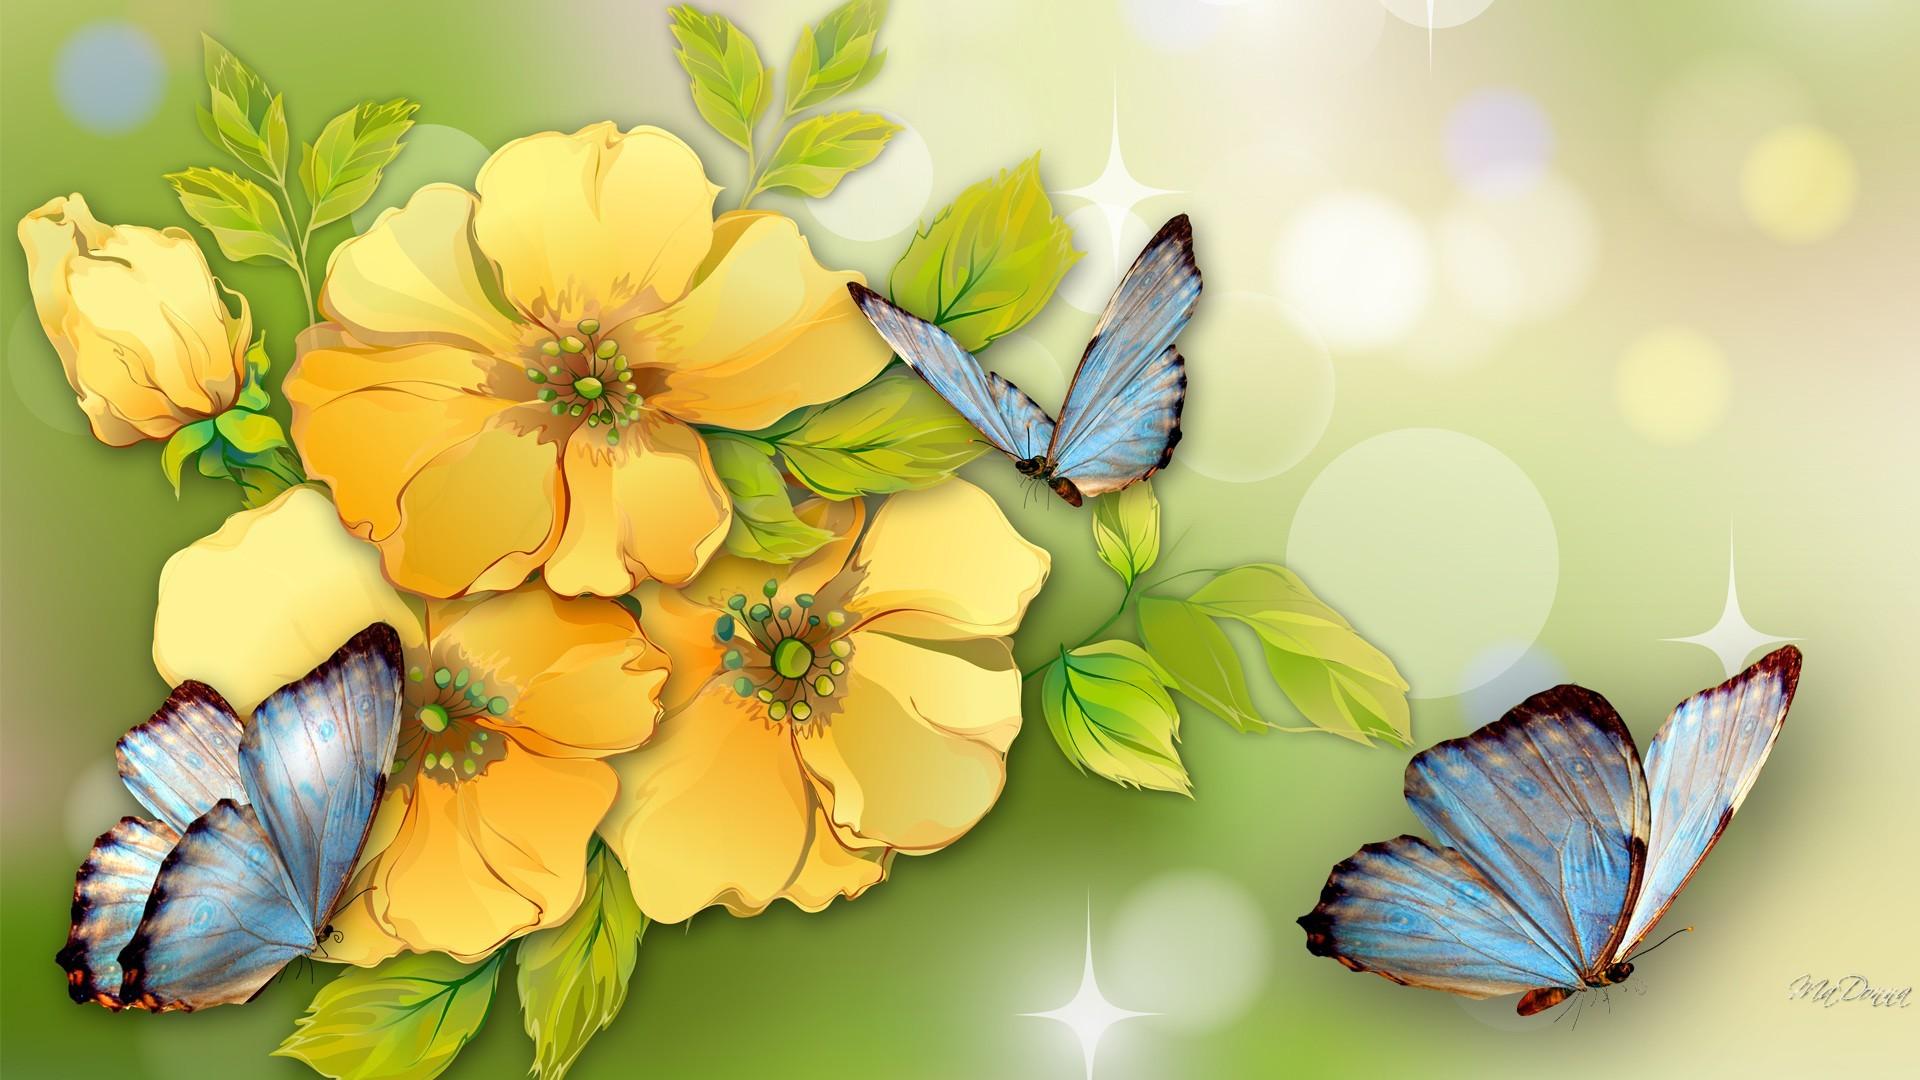 1920x1080 Flower Yellow Flowers Blue Butterflies Watercolor Summer Fragrant